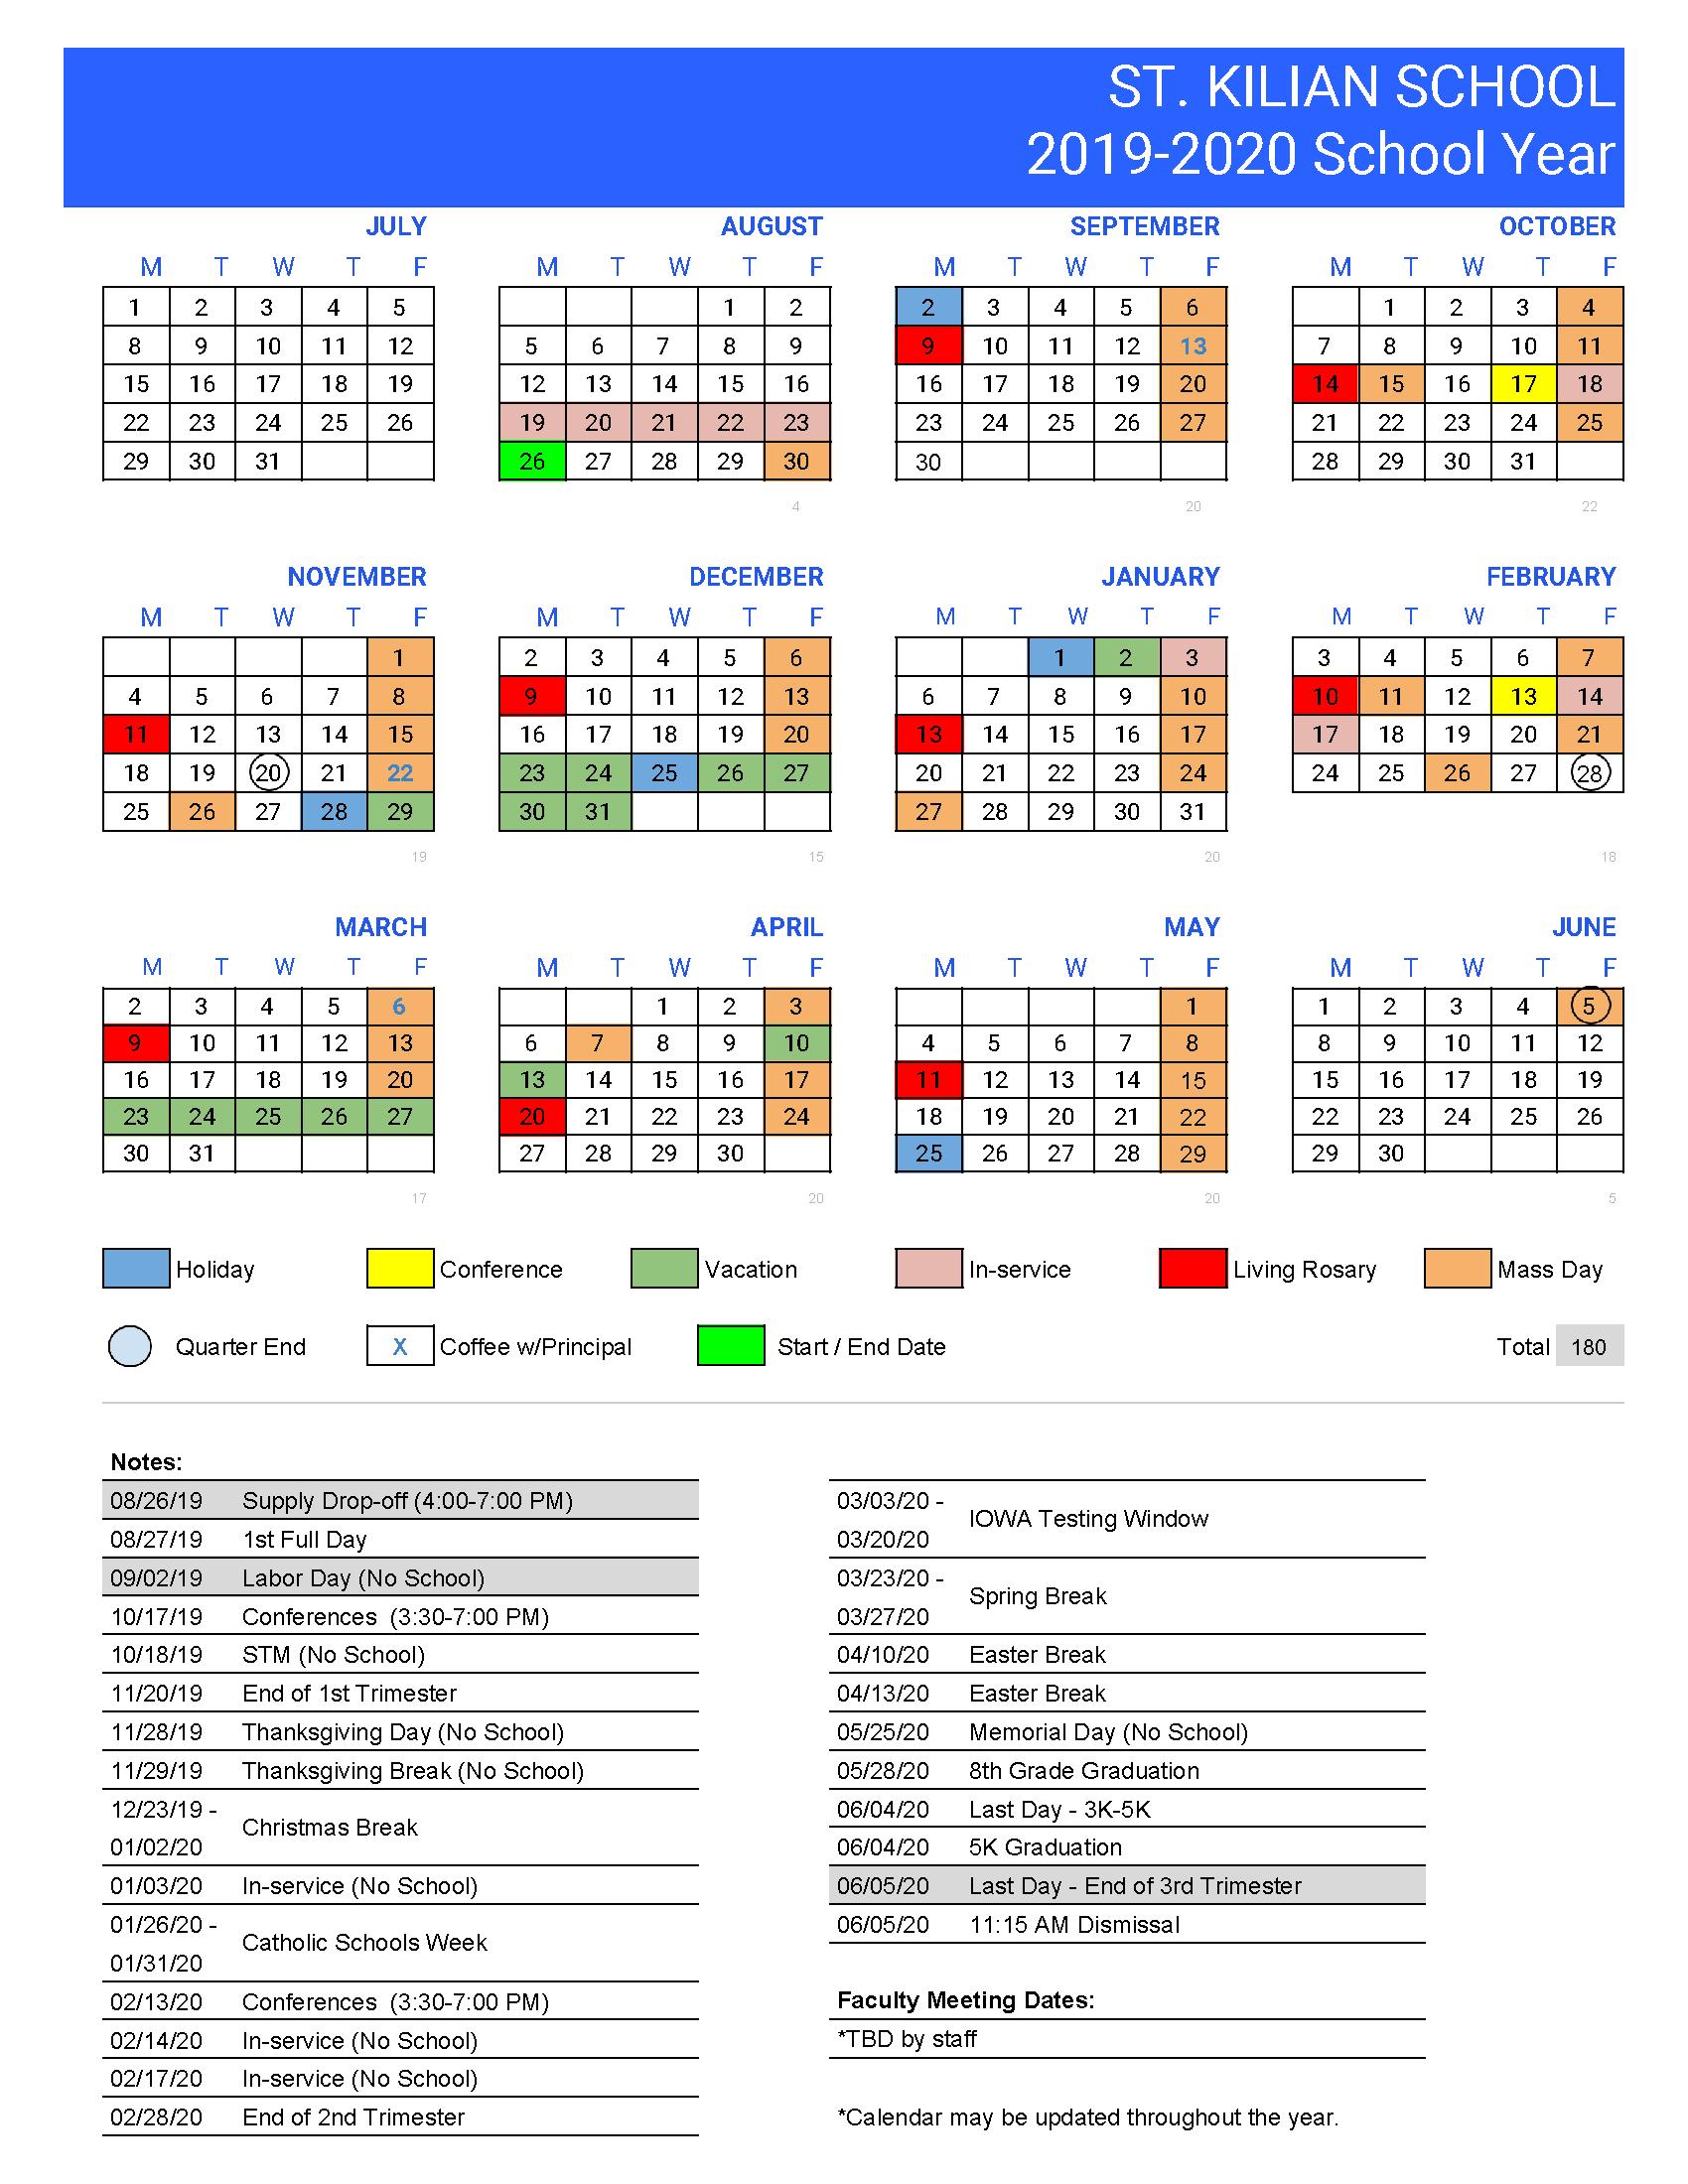 Las Cruces Isd Calendar   Printable Calendar 2020 2021 With Fort Worth Isd Calendar 2021